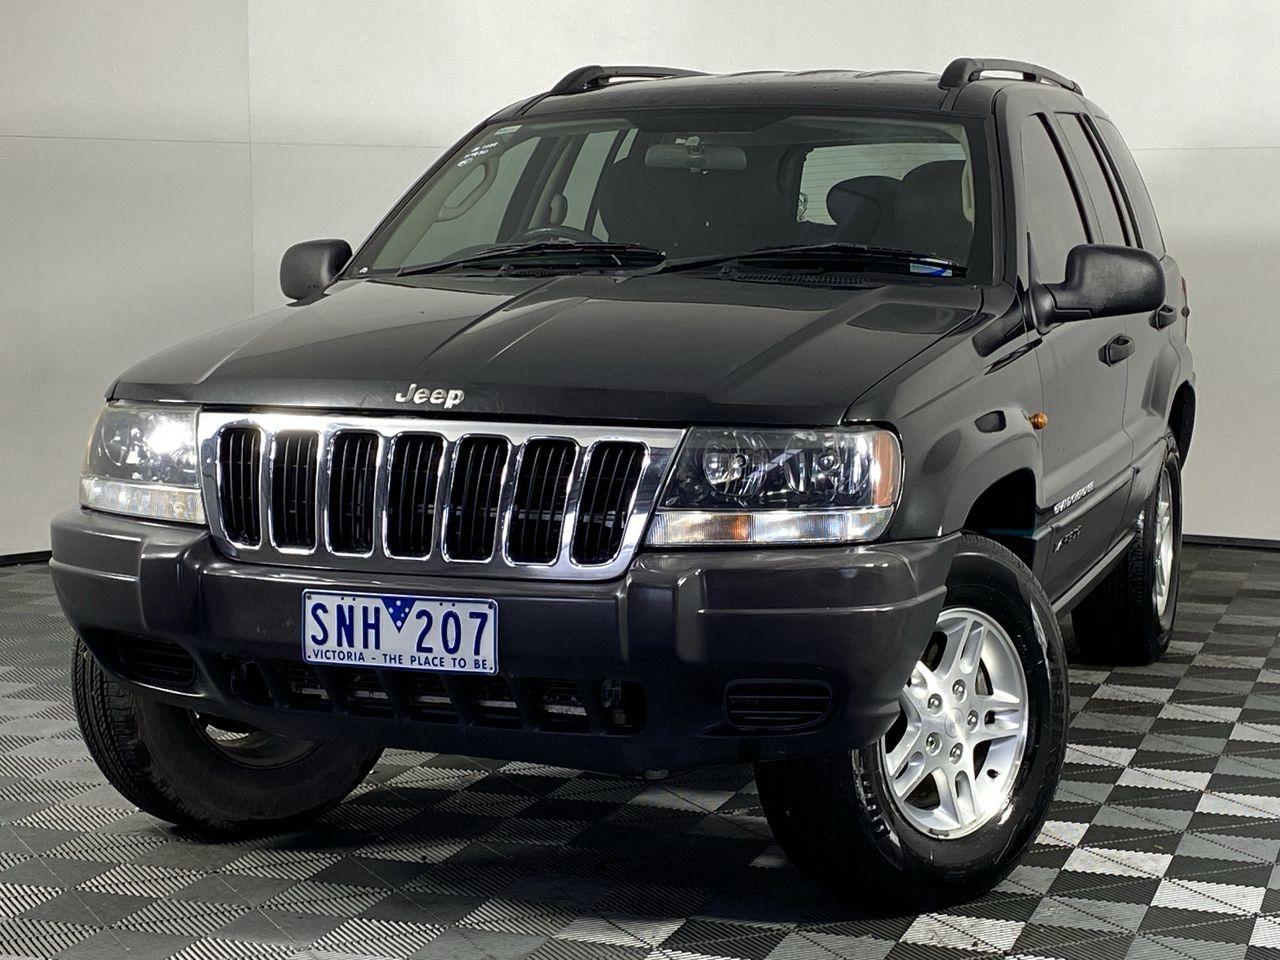 2003 Jeep Grand Cherokee Laredo (4x4) WG Automatic Wagon